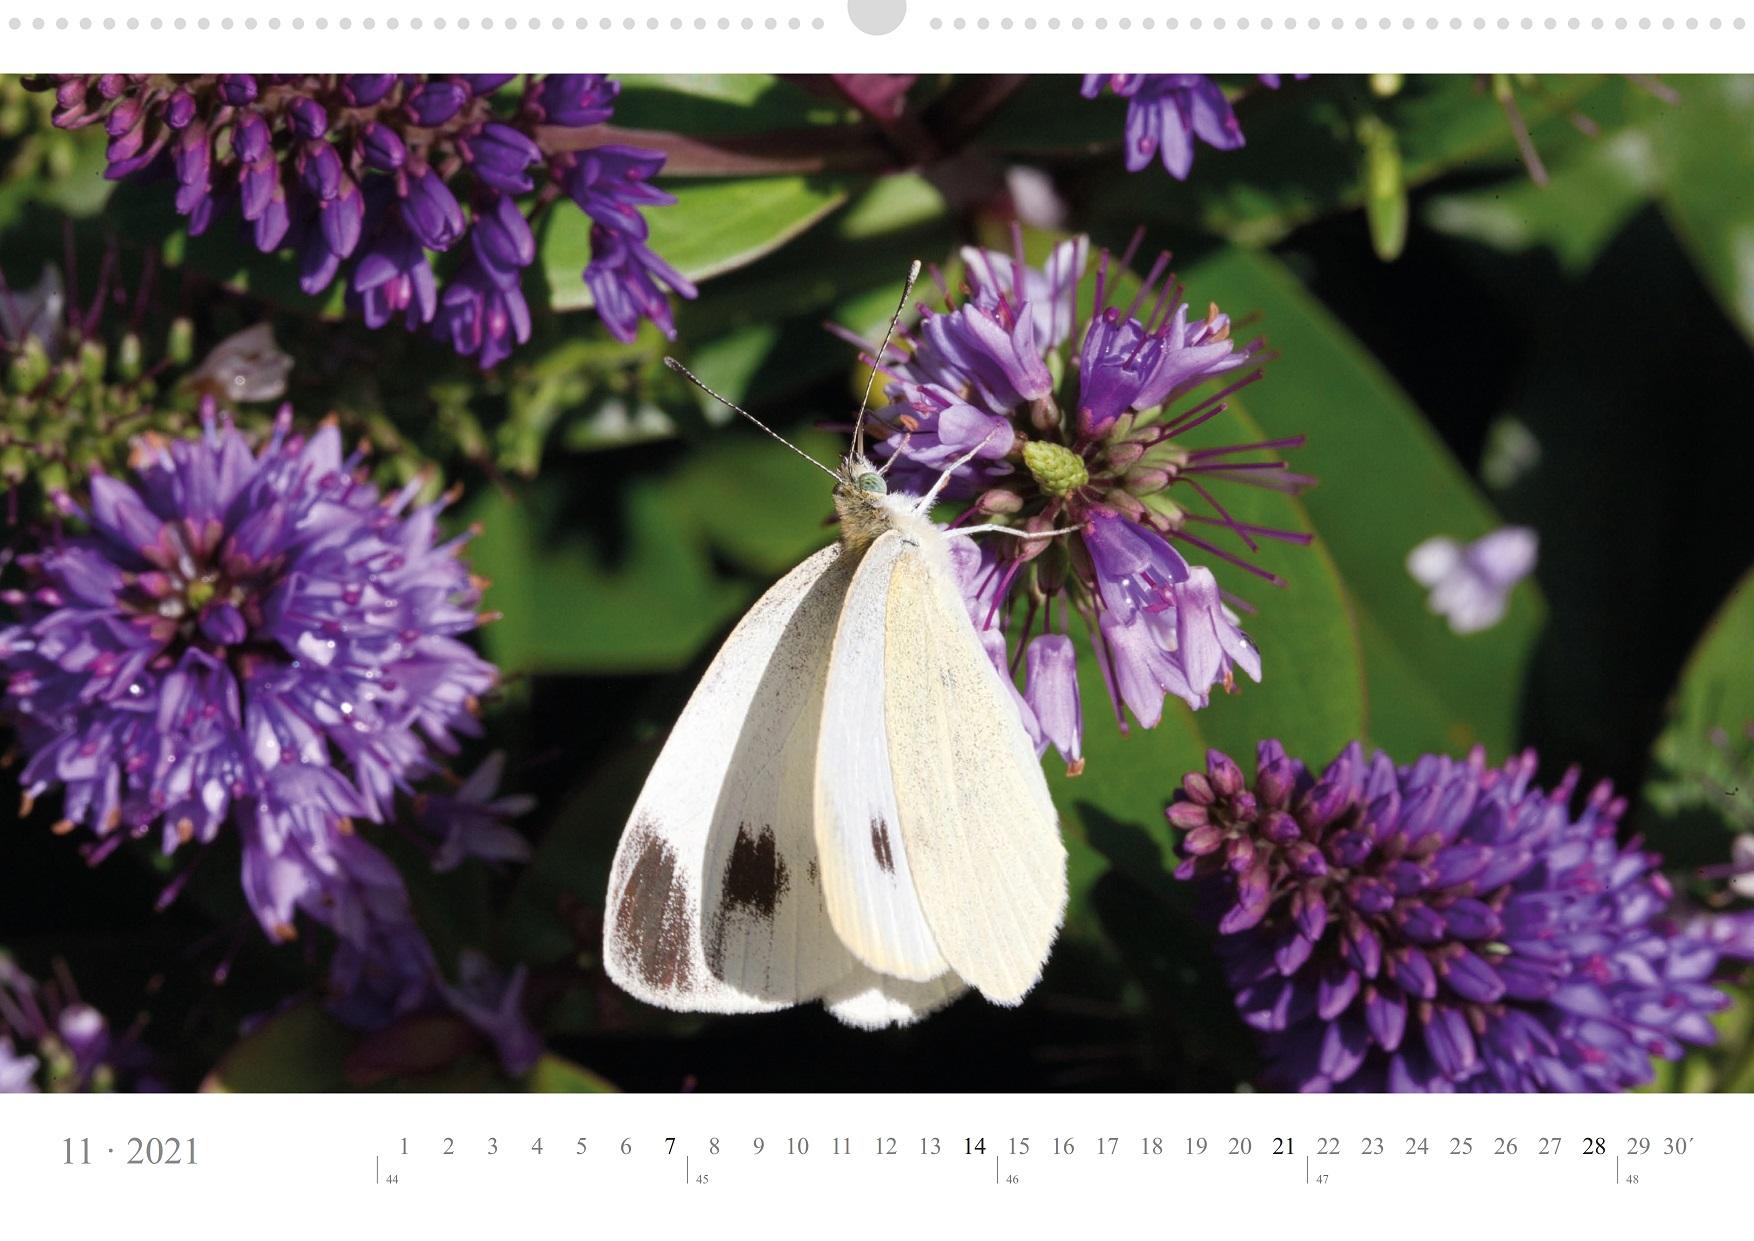 LCQ-Insekten-Kalender-2021-E1_011-1